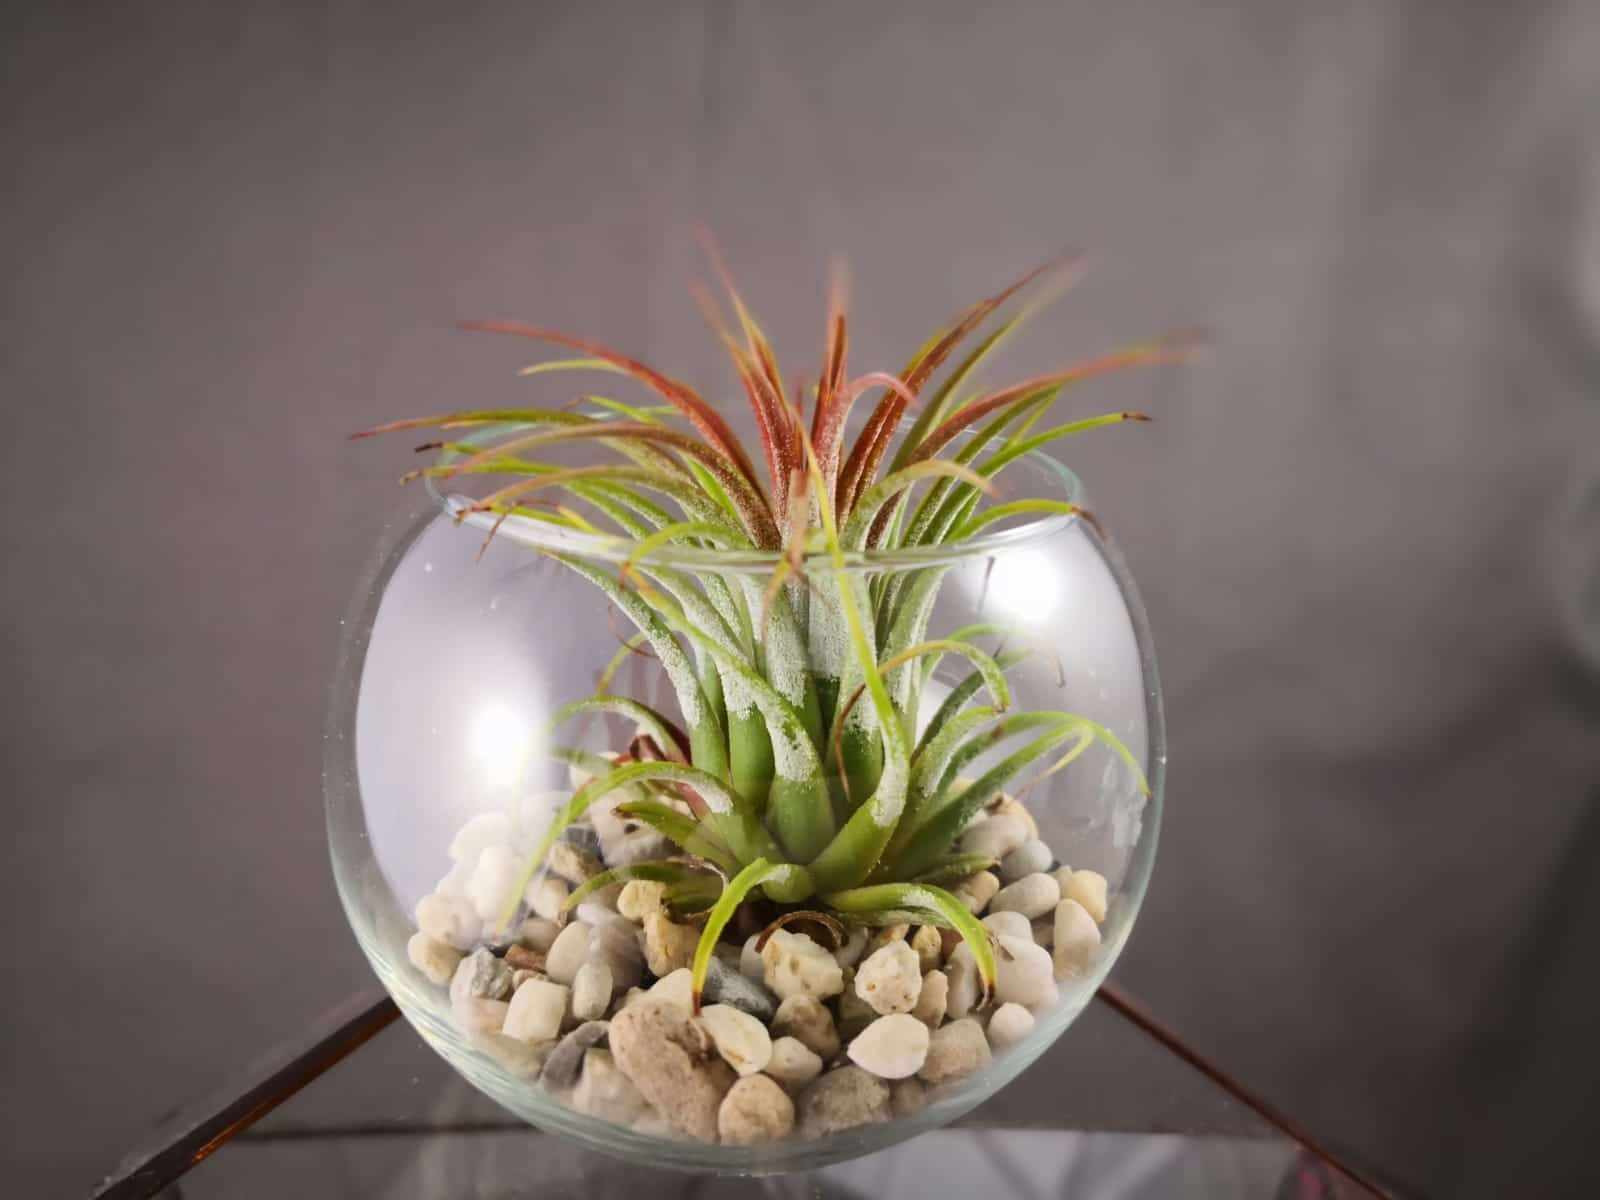 marturie in bol de sticla cu o planta aeriana, pietricele natur, fundal de studio foto